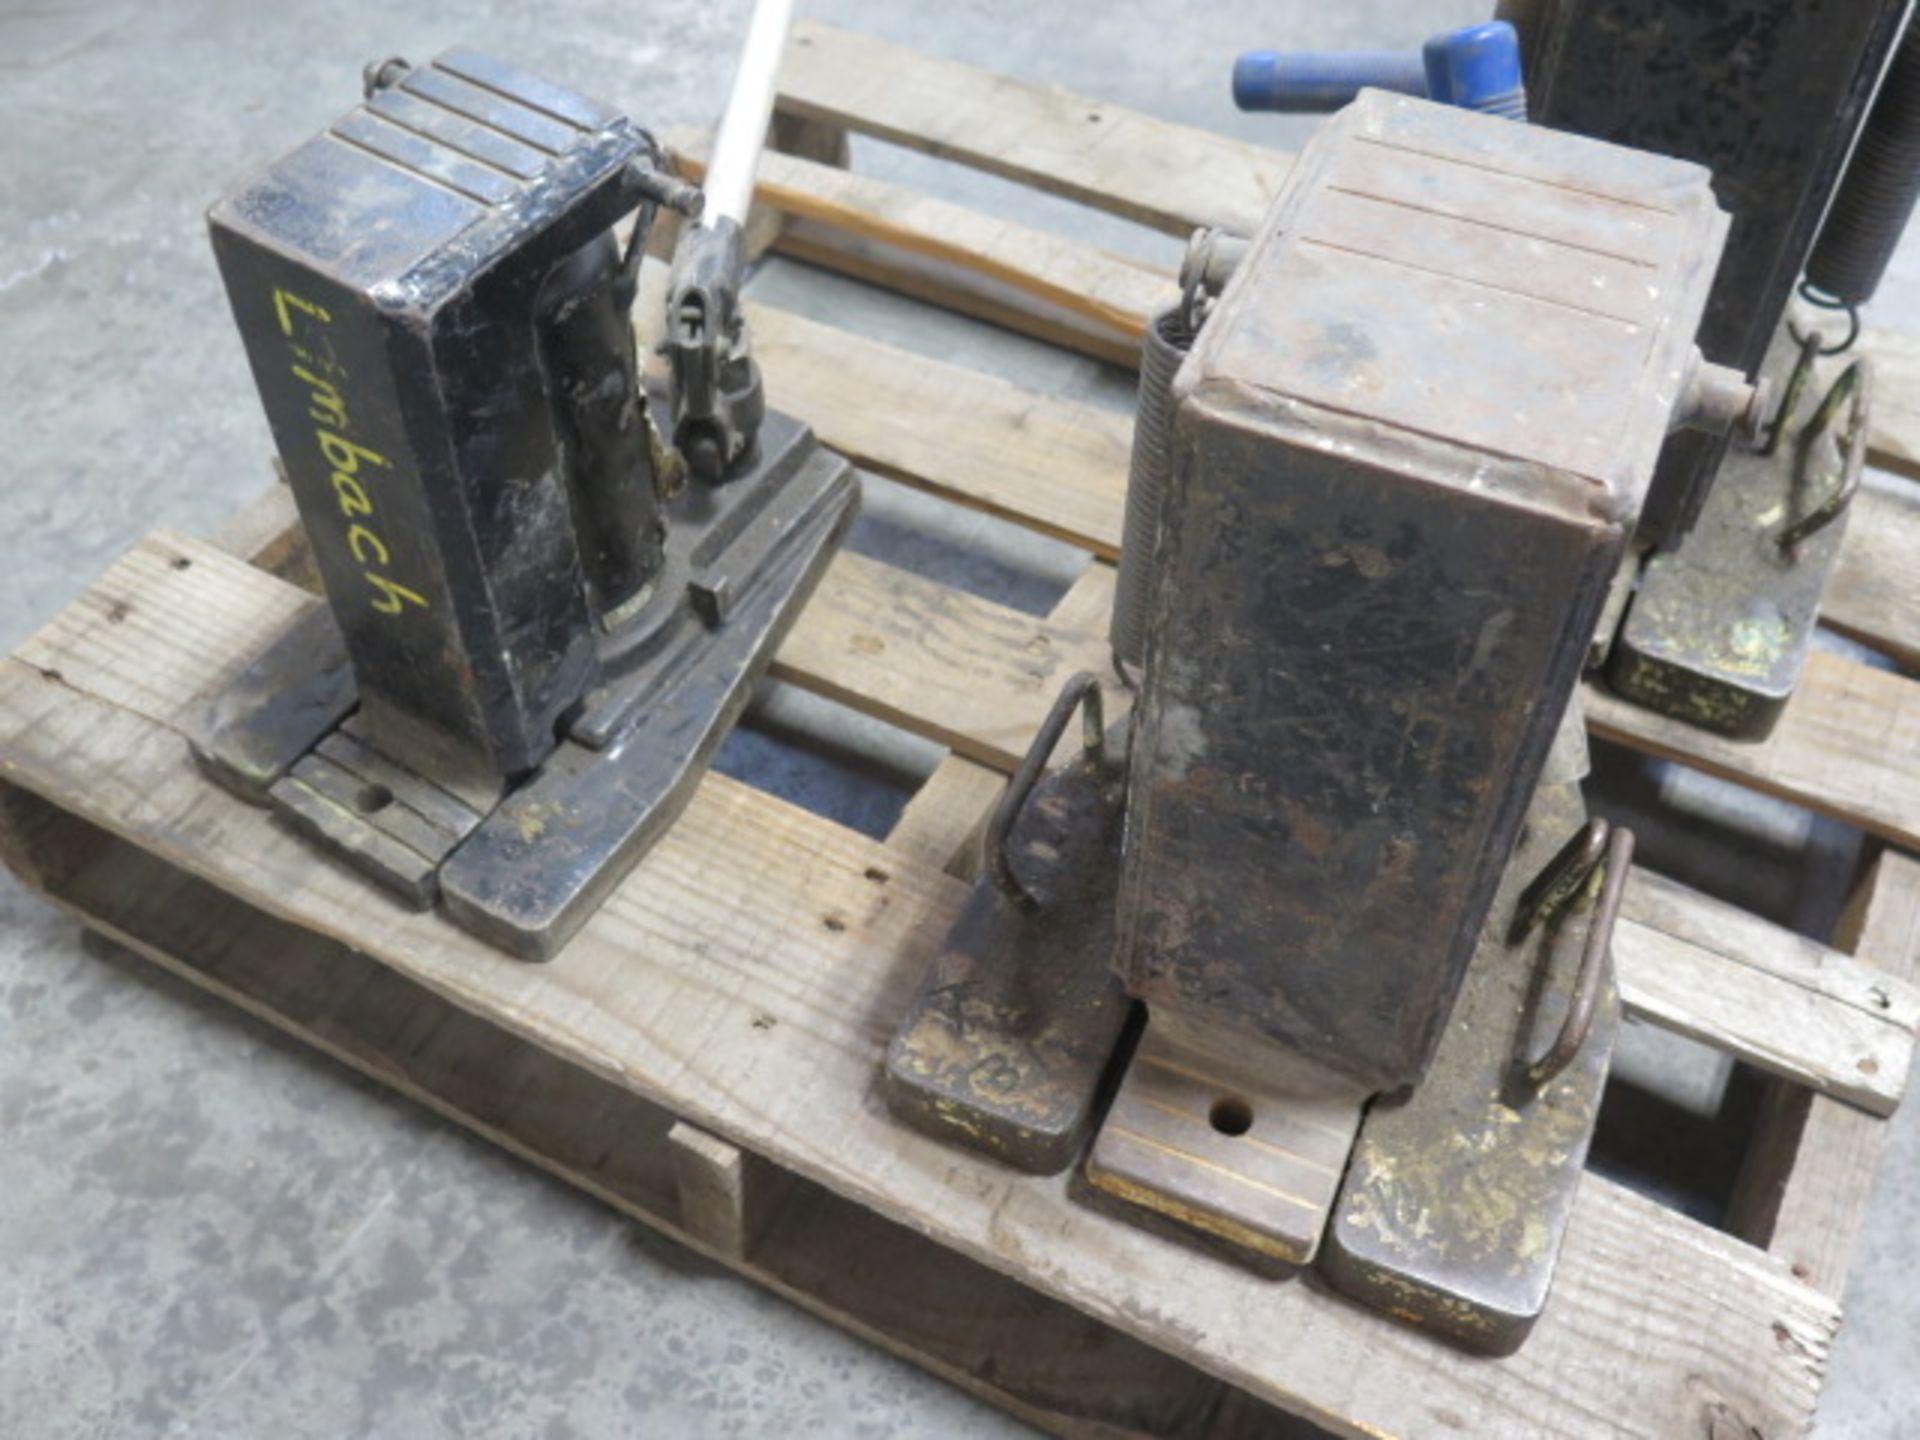 Simplex 10 Ton Hydrauic Machinery Jacks (2) and Omega 6 Ton Hydraulic Machinery Jack (SOLD AS-IS - - Image 5 of 7